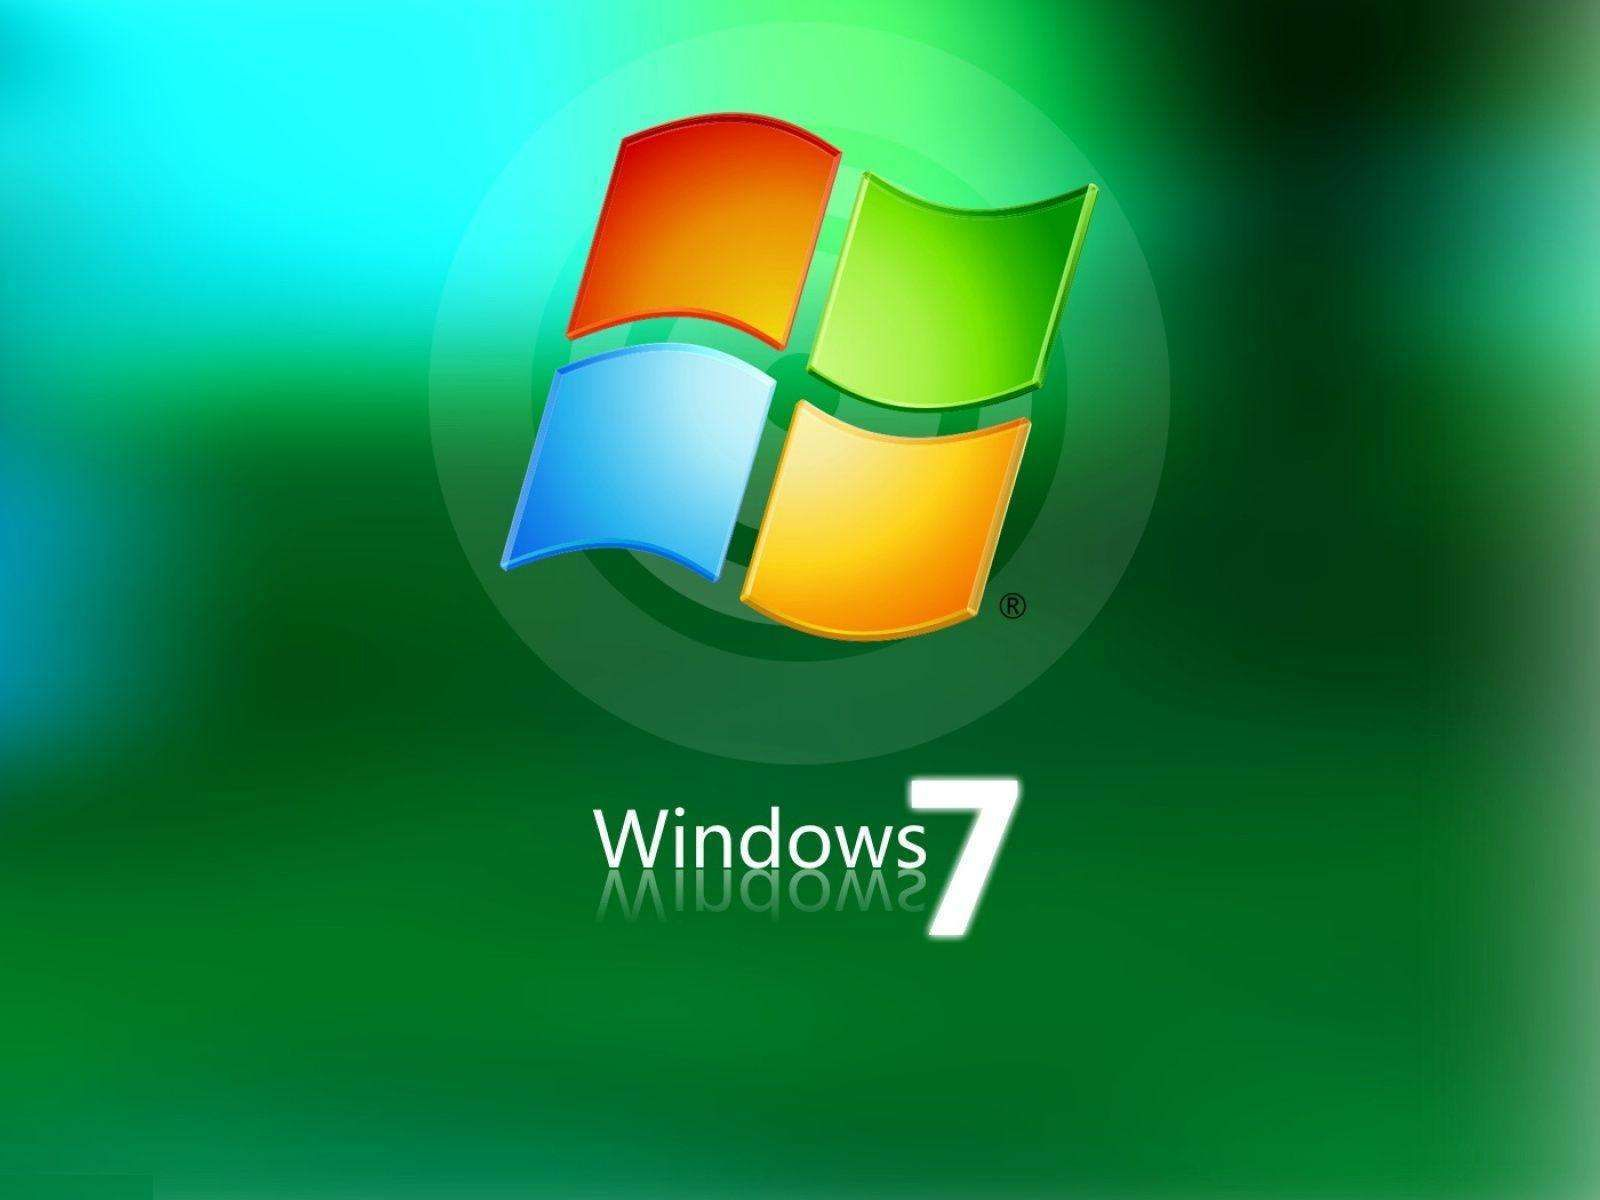 Window 7 Wallpaper Download Yoyo   New Windows 7 Desktop 1600x1200